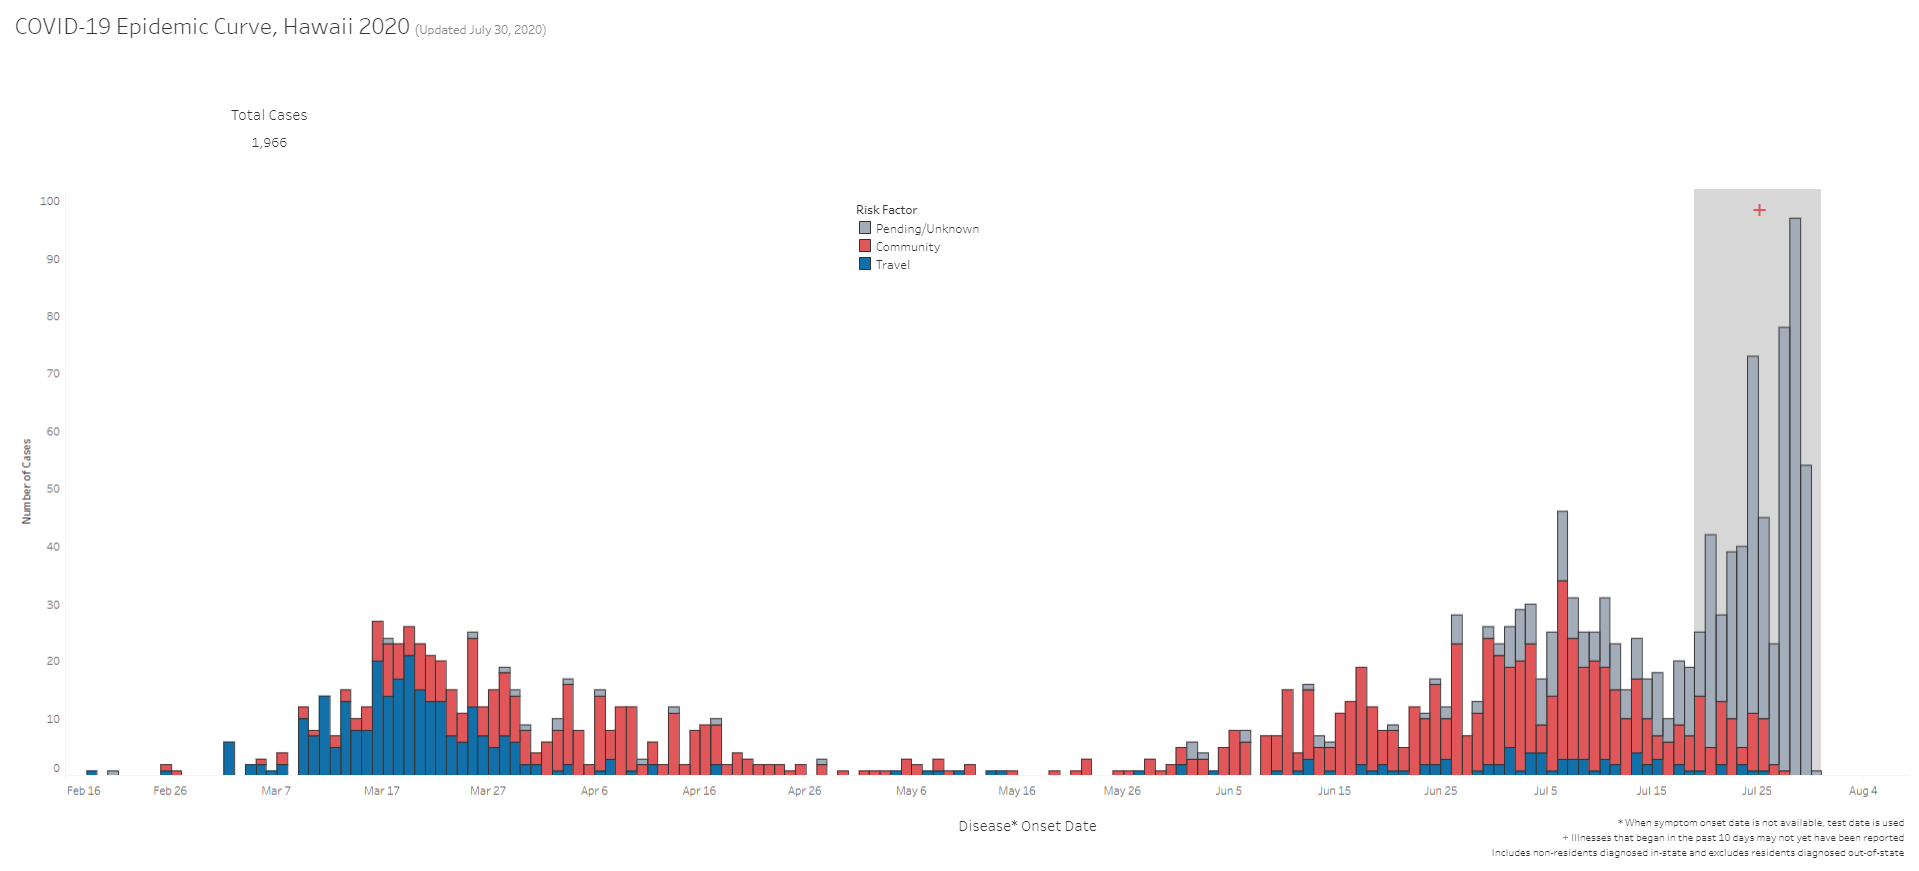 COVID-19 Epidemic Curve Hawaii July 30, 2020